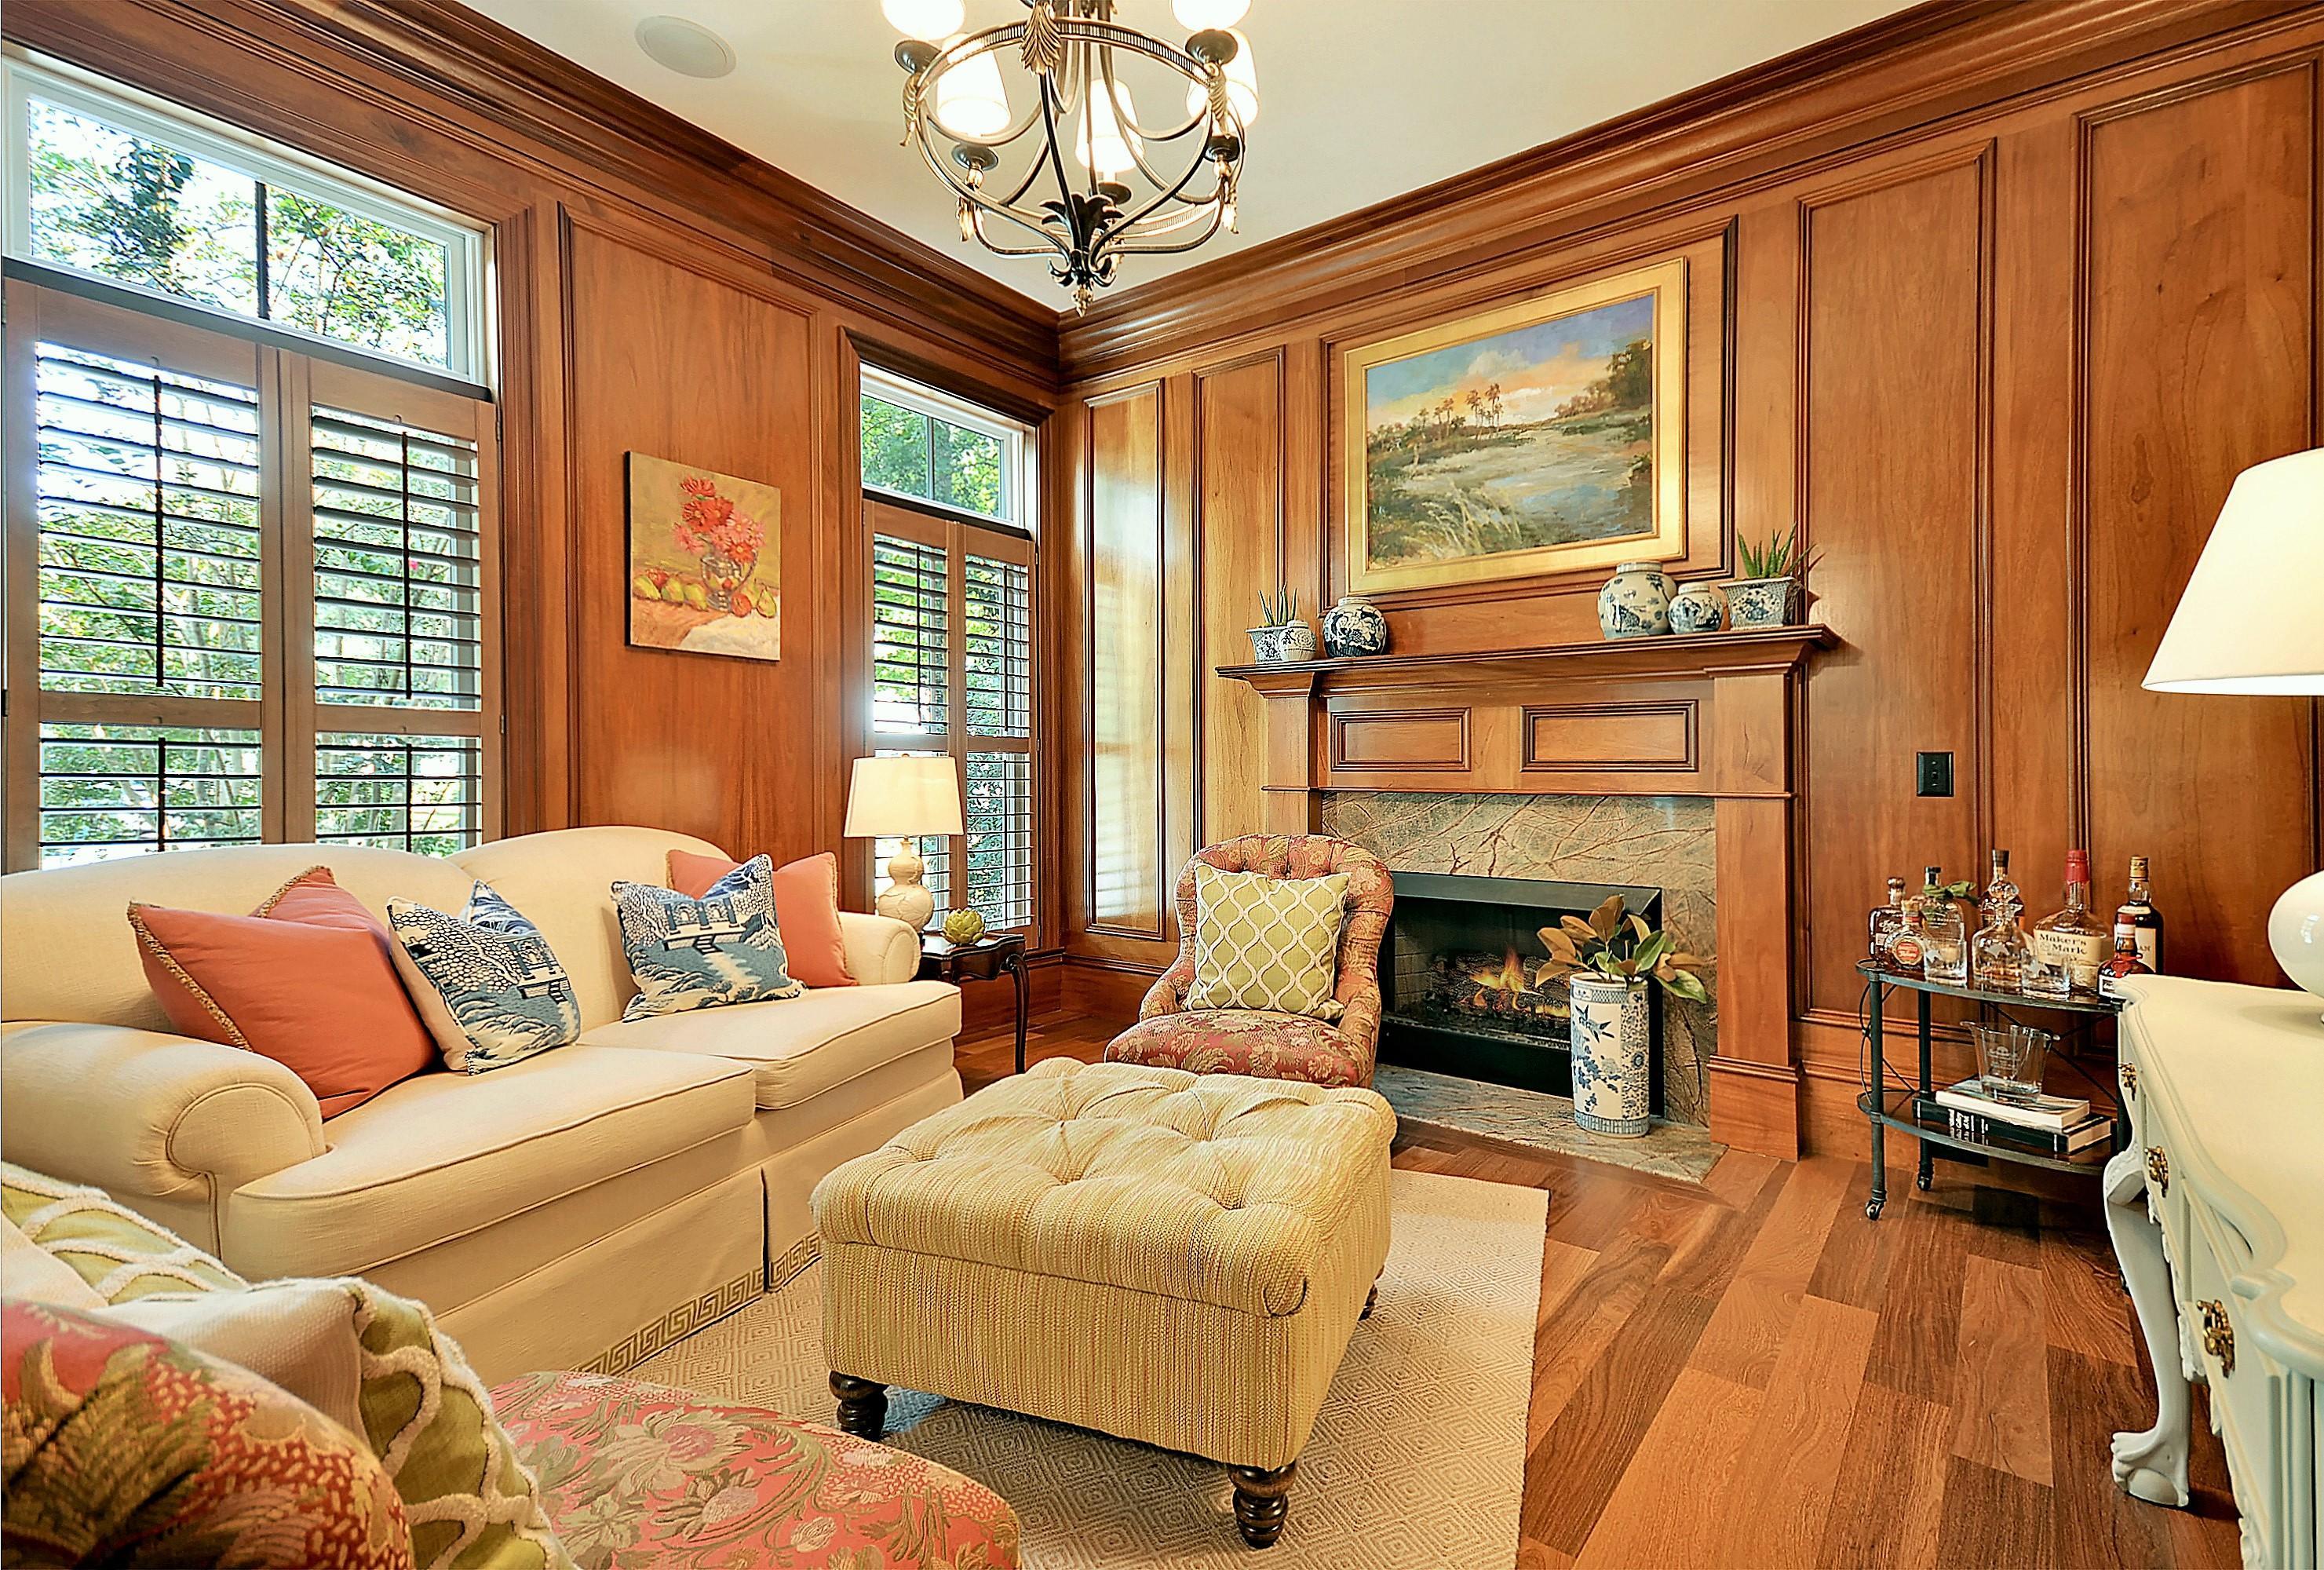 Daniel Island Homes For Sale - 27 Watroo, Charleston, SC - 10